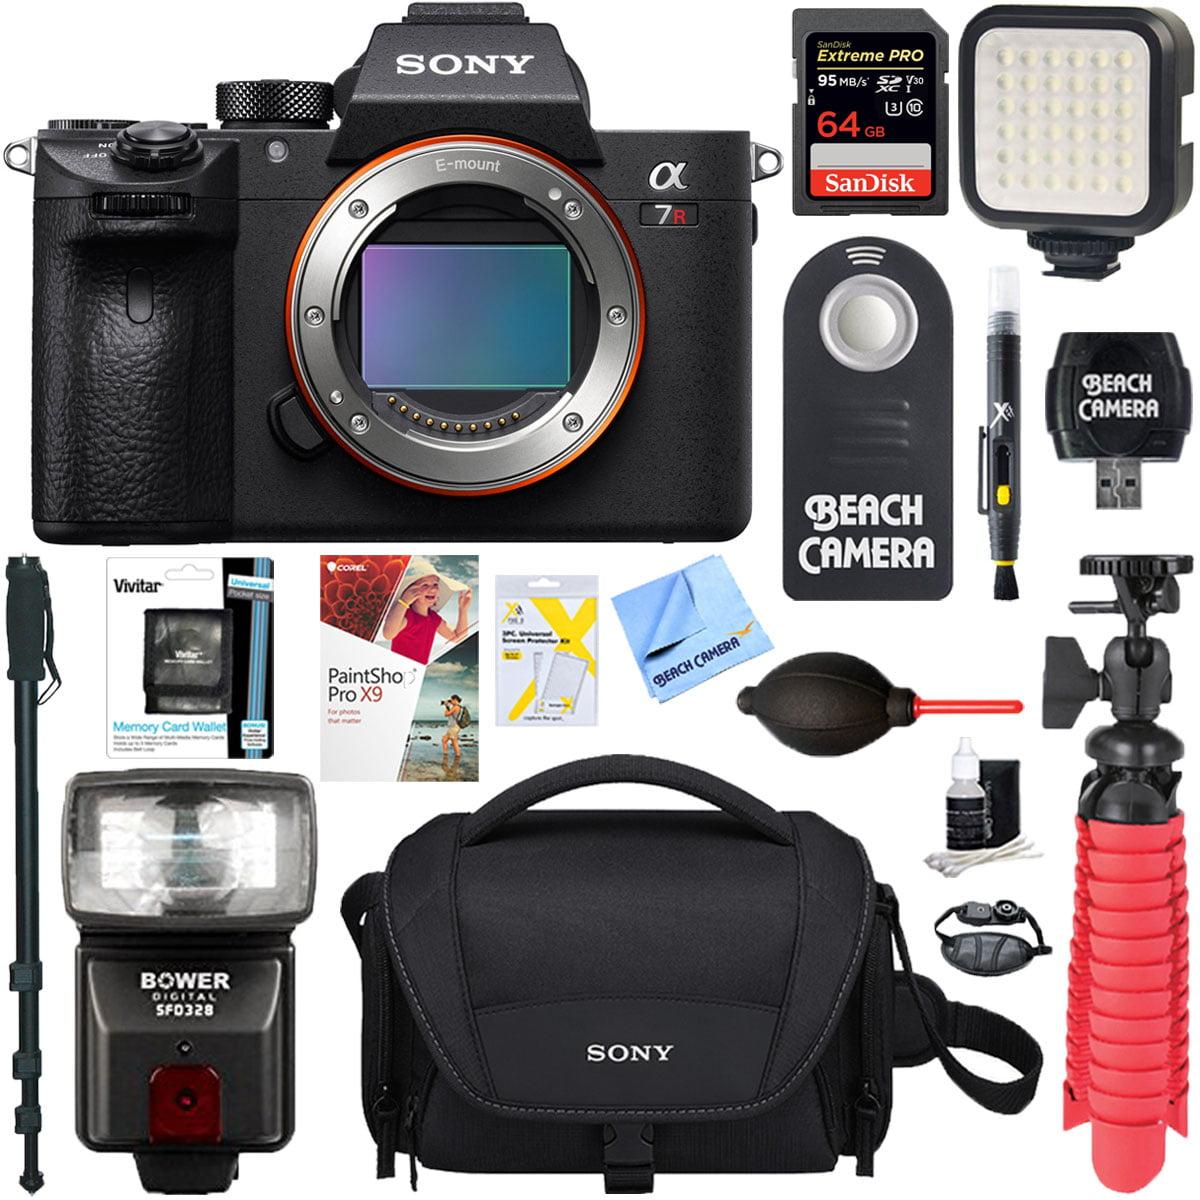 Sony a7R III 42.4MP Full-frame Mirrorless Interchangeable Lens Camera Body + 64GB Memory & Flash a7RIII Accessory Bundle